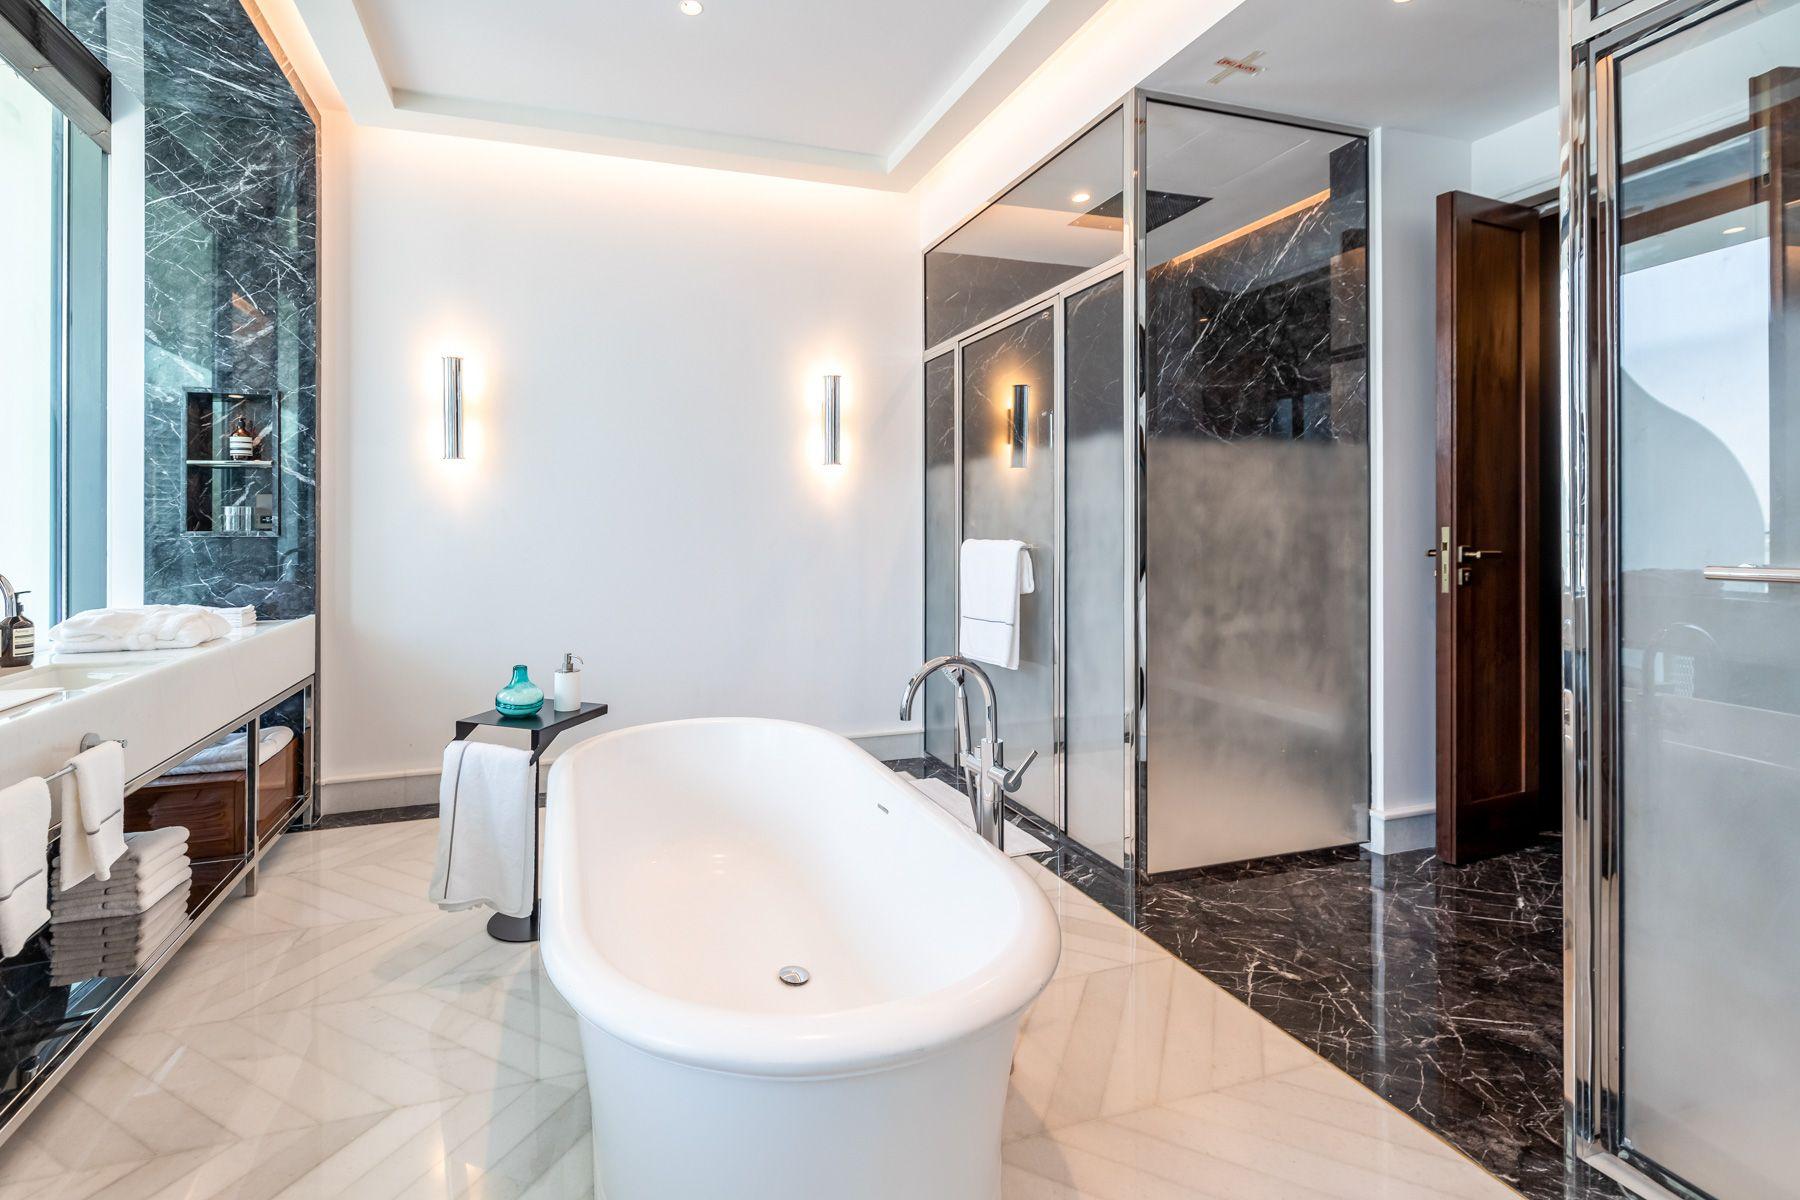 dorchester collection penthouse in dubai